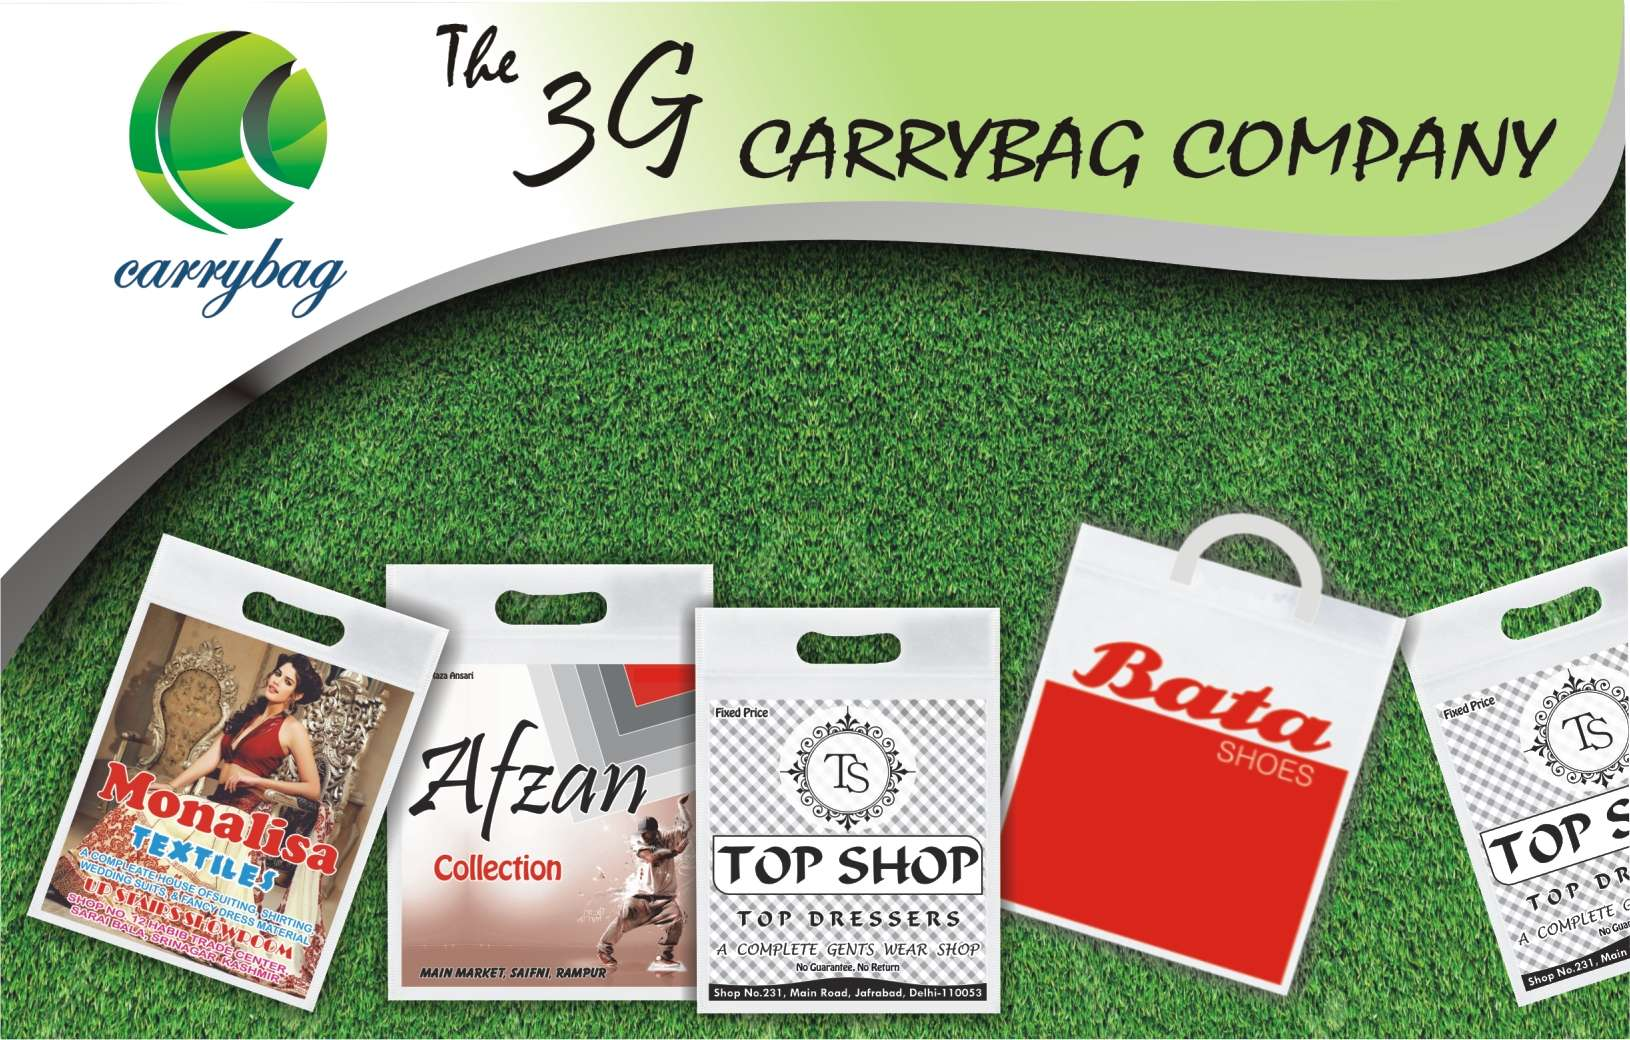 The 3g Carrybag Company